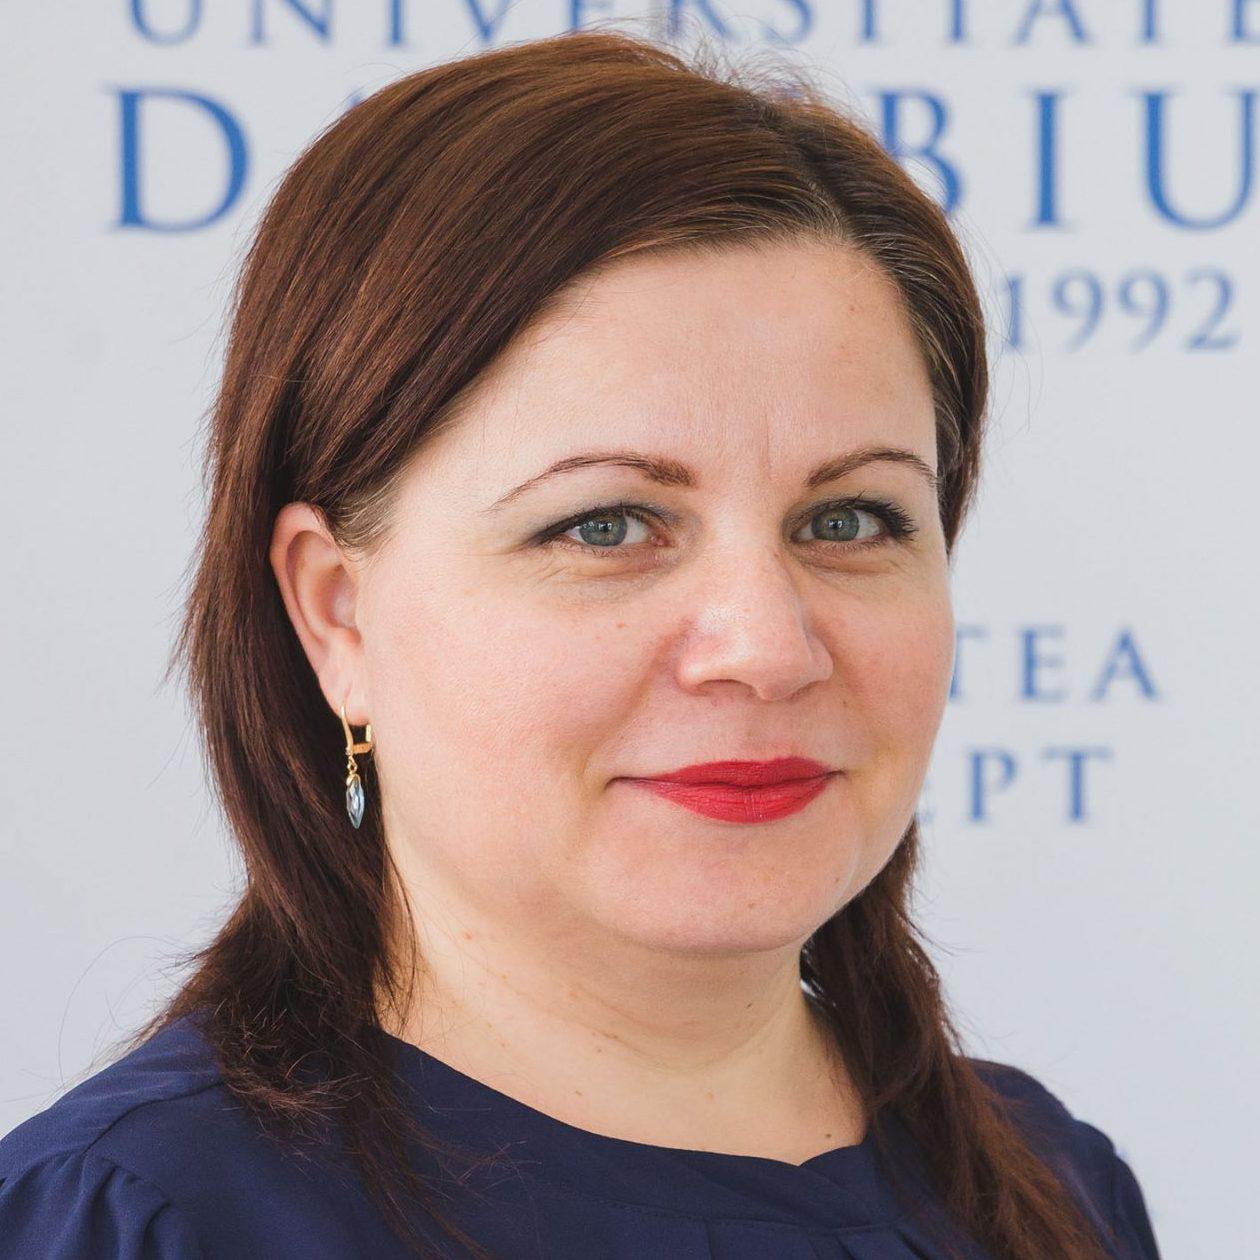 Dorina Puscasu